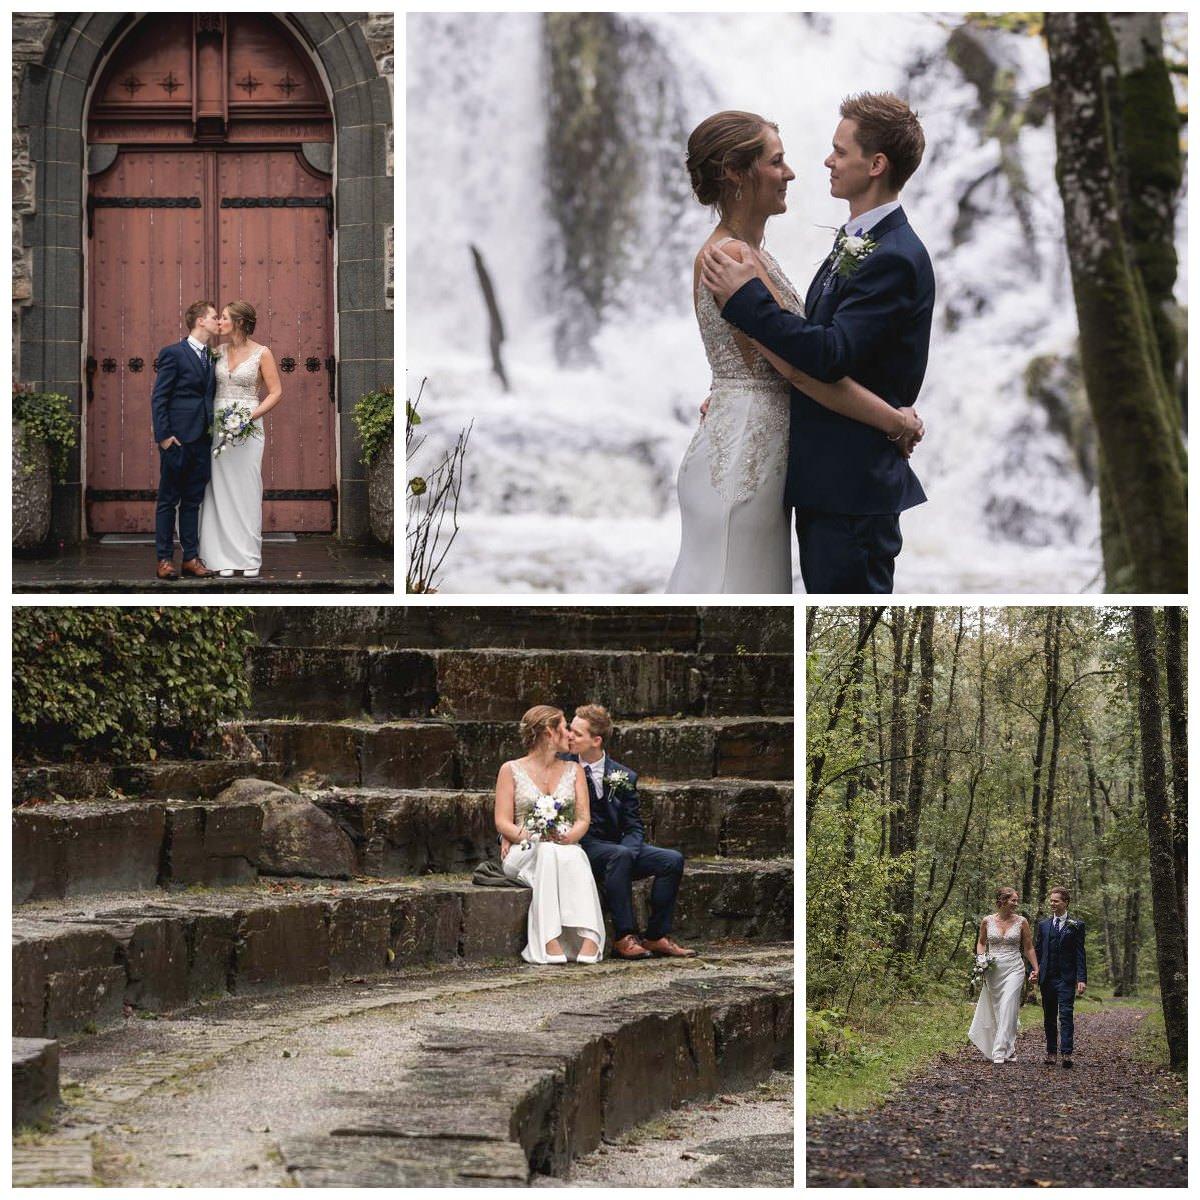 fana kirke kirkedør foss amfi kulturpark fanakulturpark brudepar brud brudgom